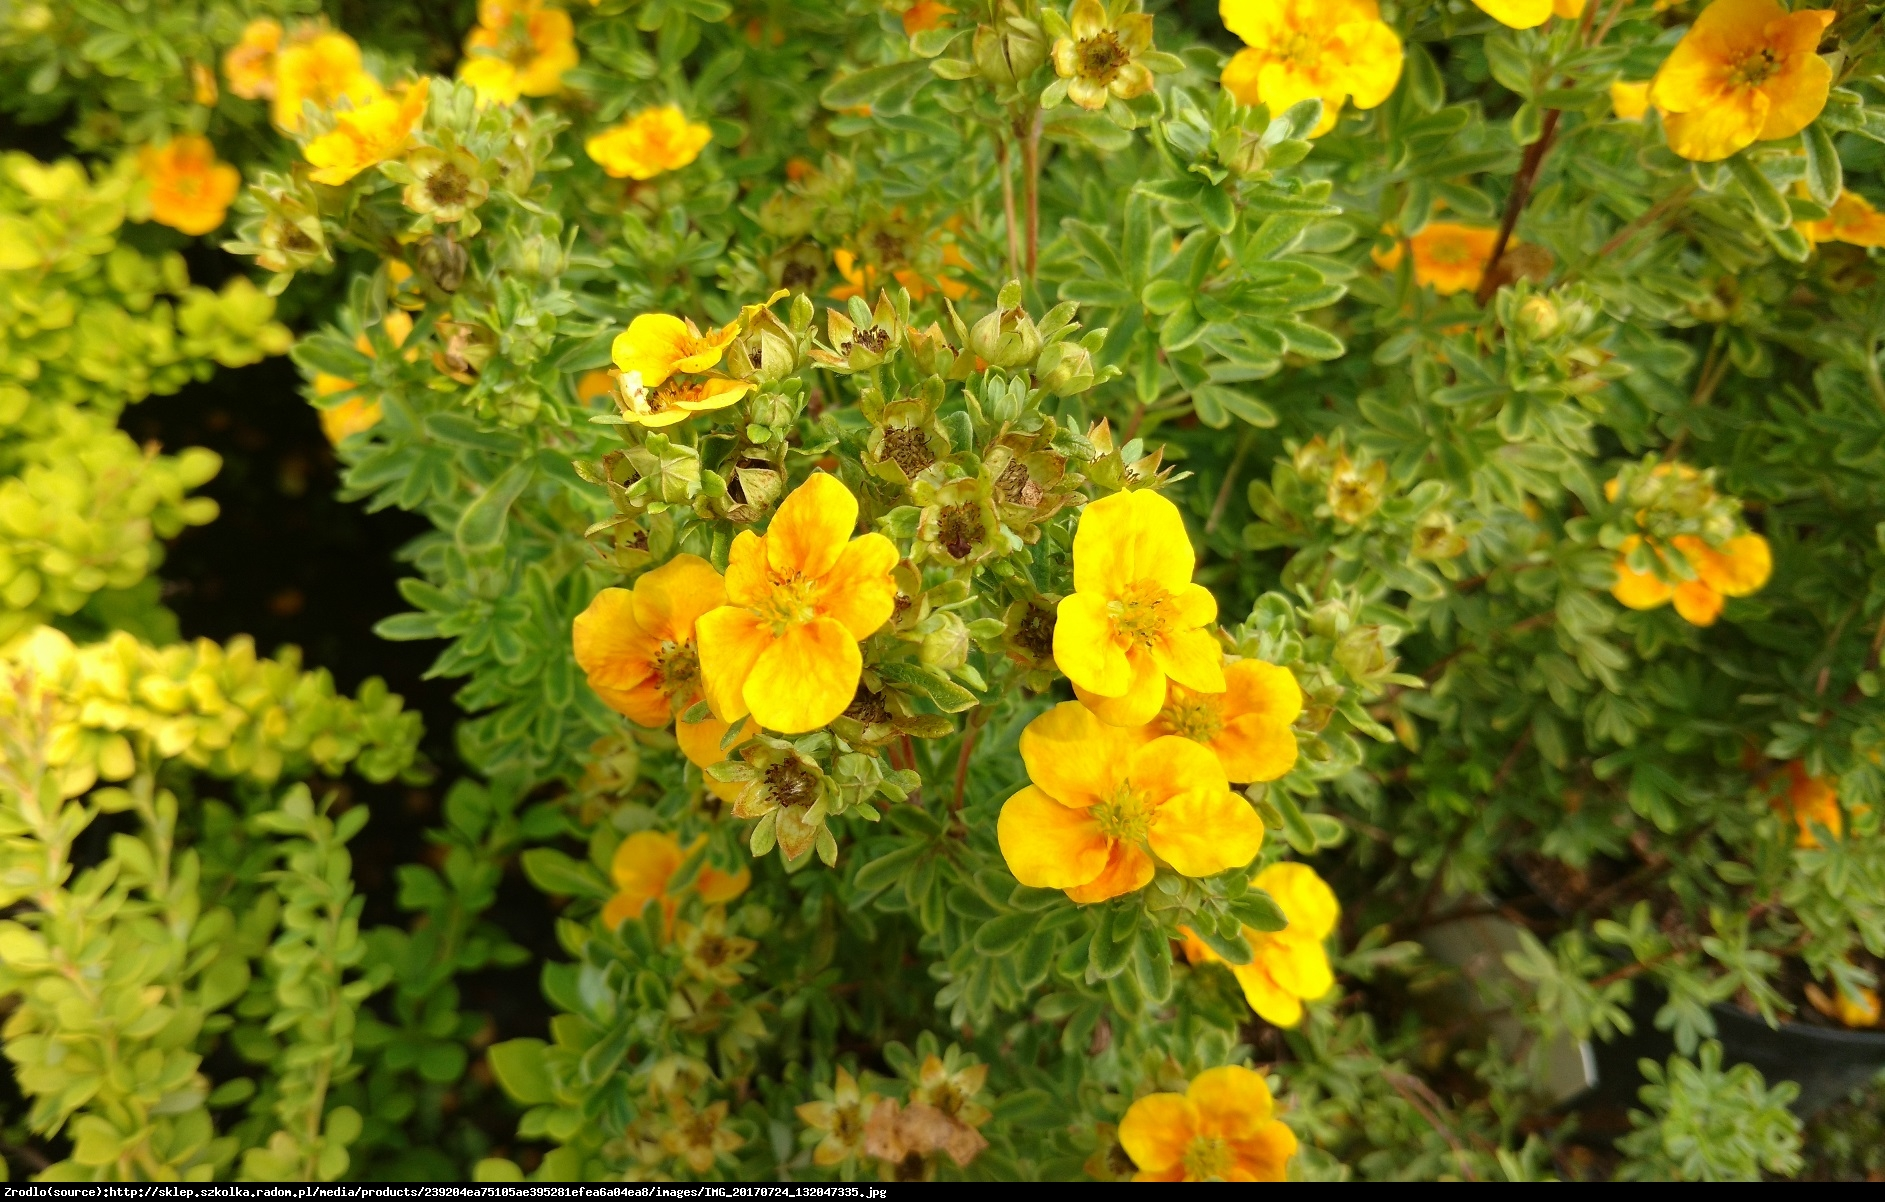 pięciornik krzewiasty MANGO TANGO - Potentilla fruticosa MANGO TANGO